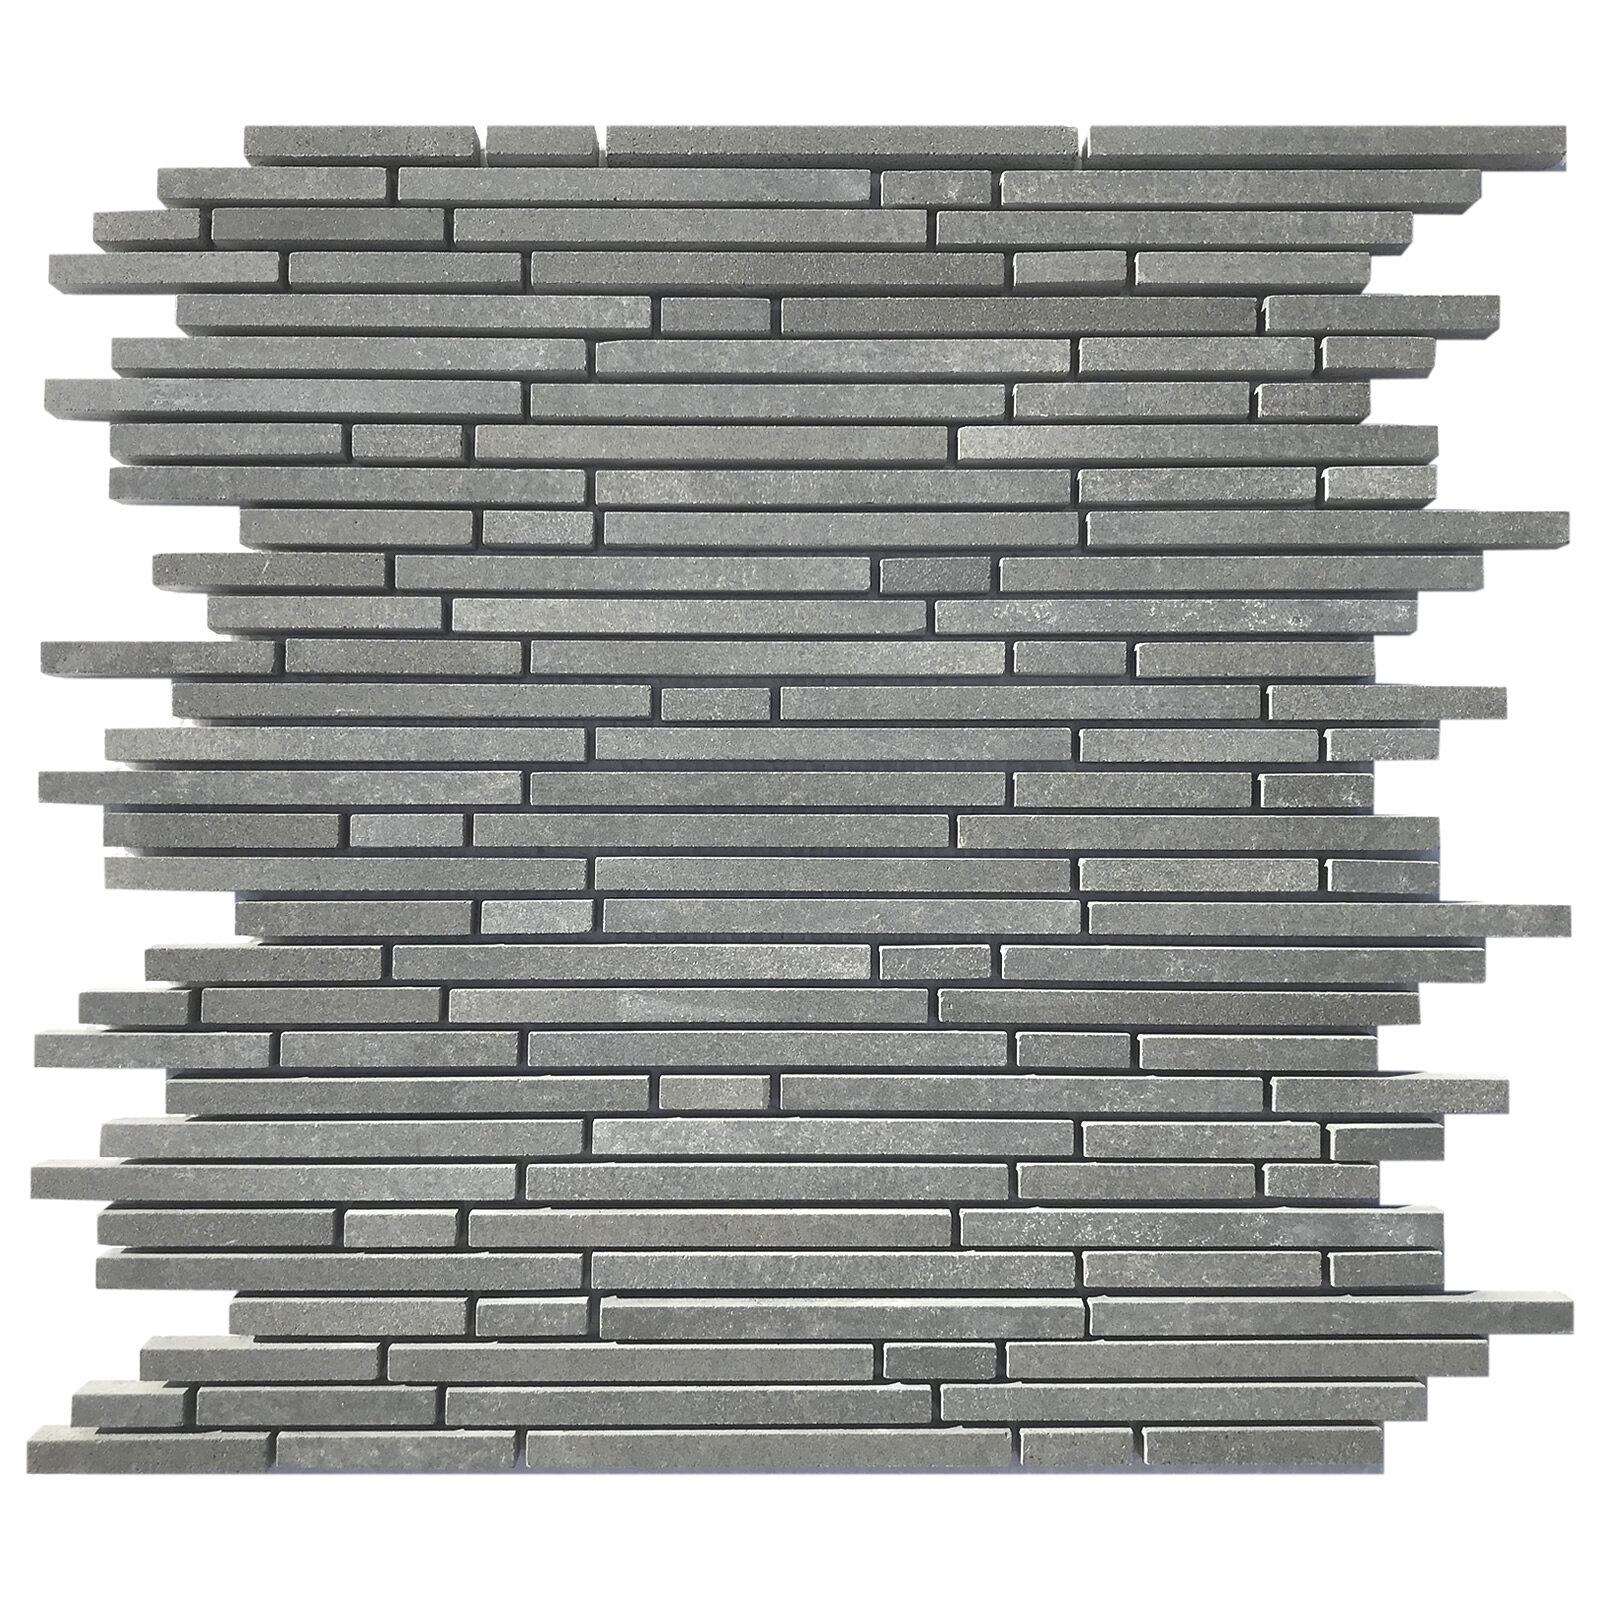 Parvatile Lava Random Strips Random Sized Stone Mosaic Basalt Tile Wayfair